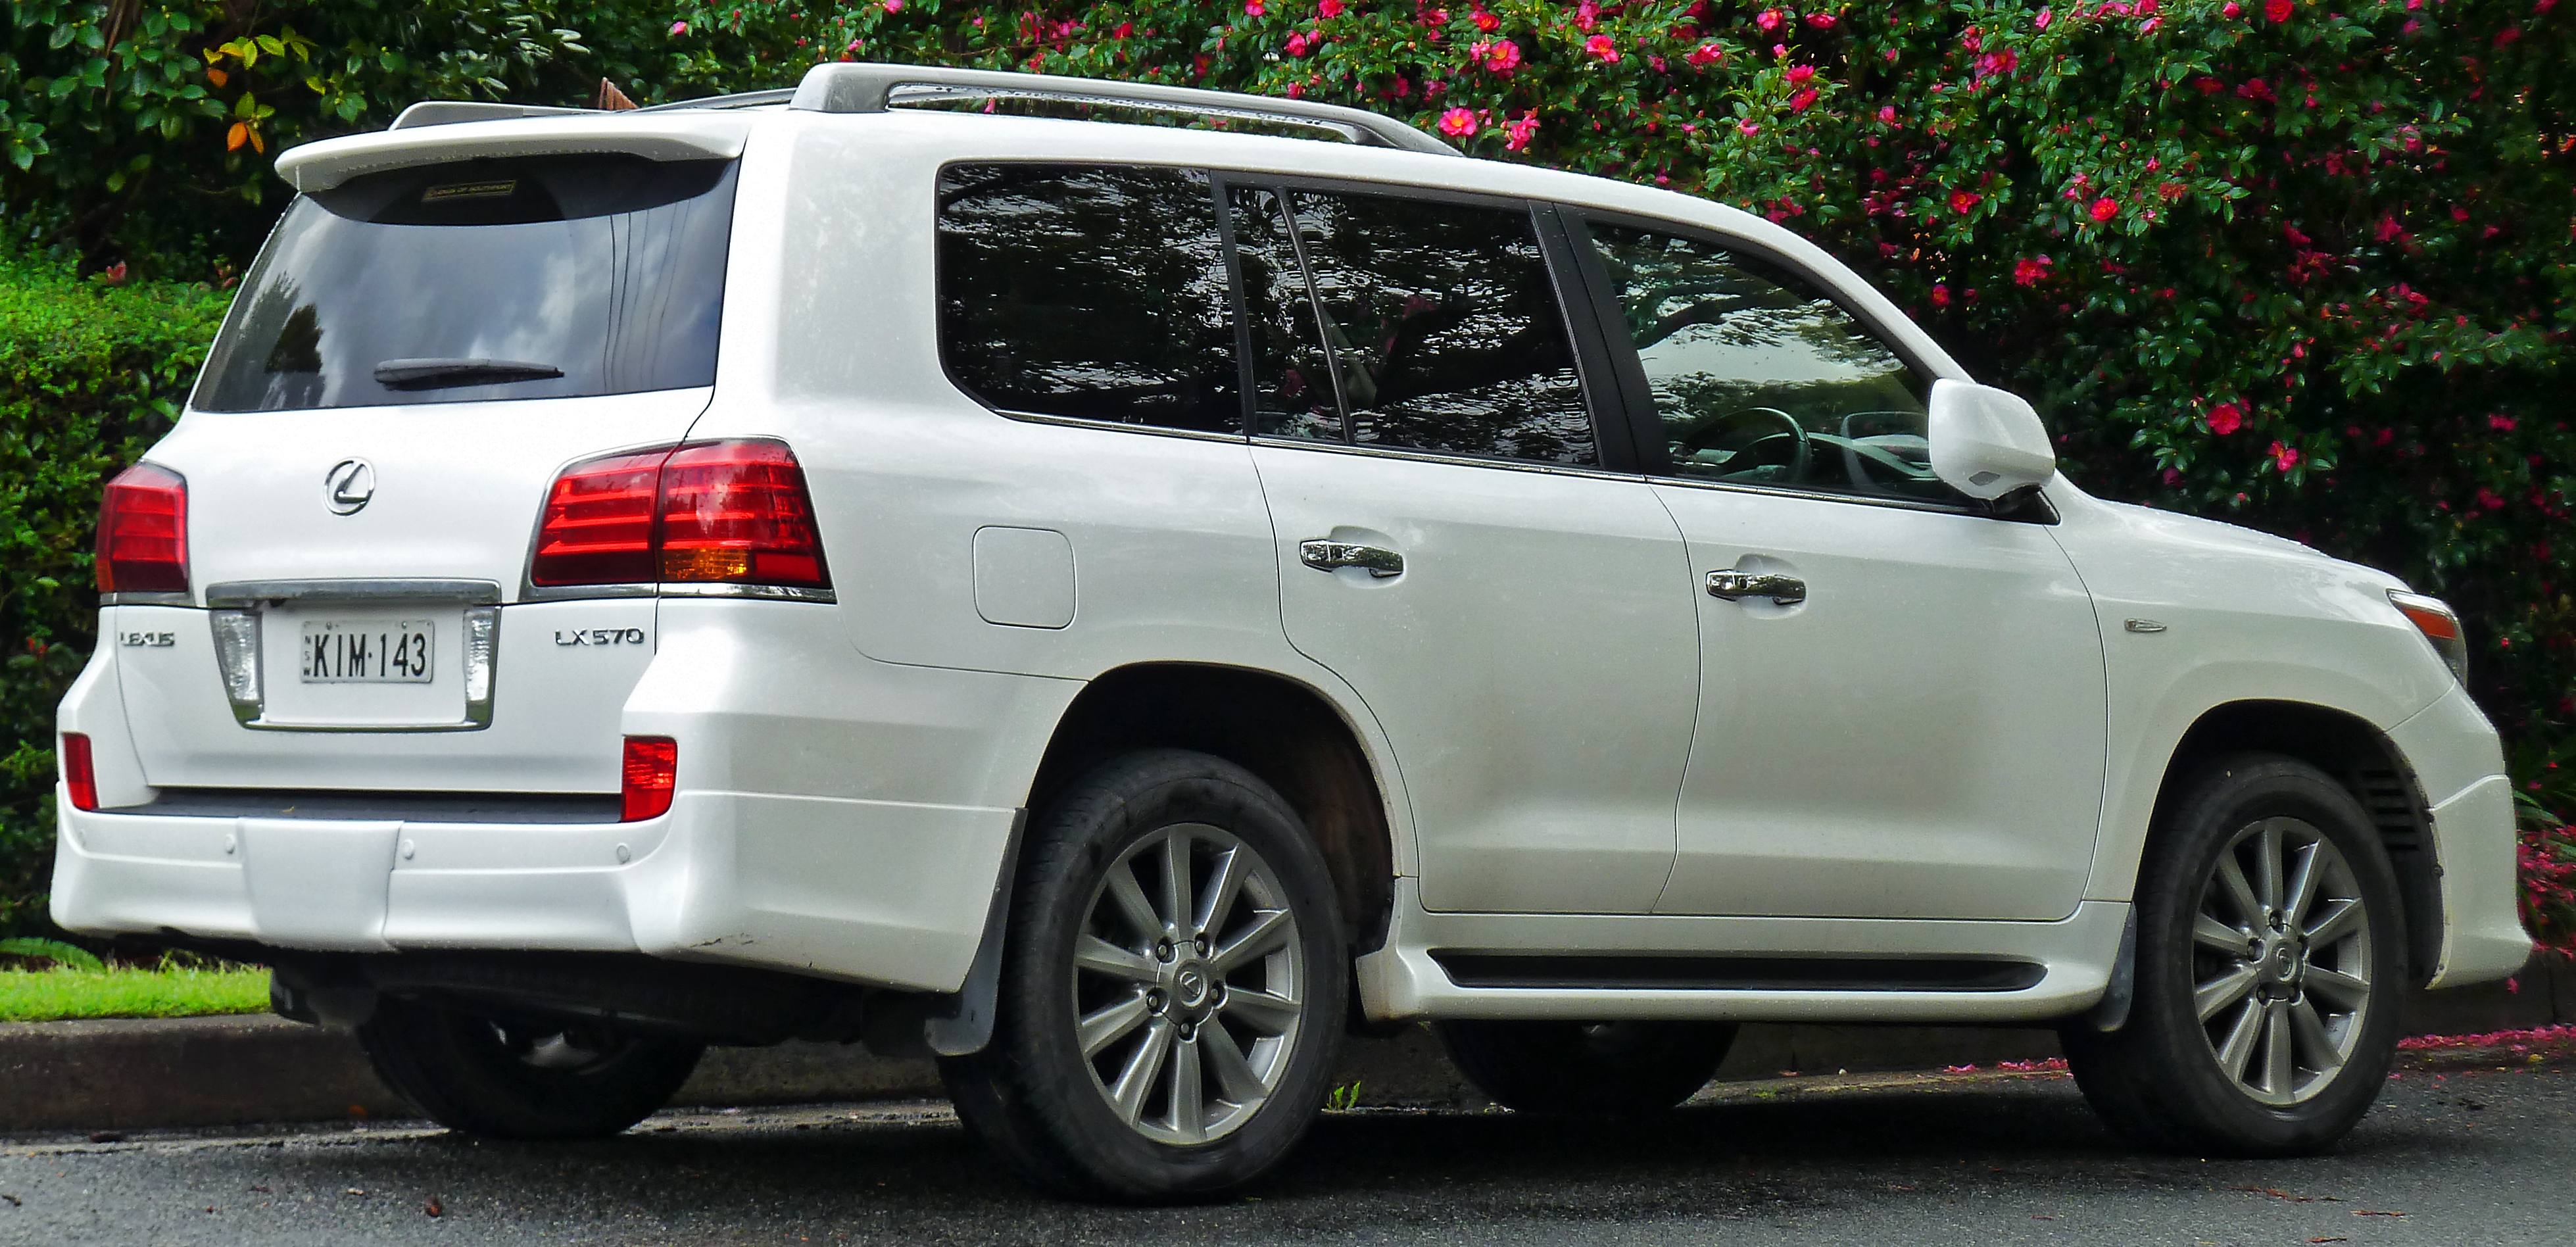 File 2008 2011 lexus lx 570 urj201r sports luxury wagon 2011 04 28 03 jpg wikimedia commons